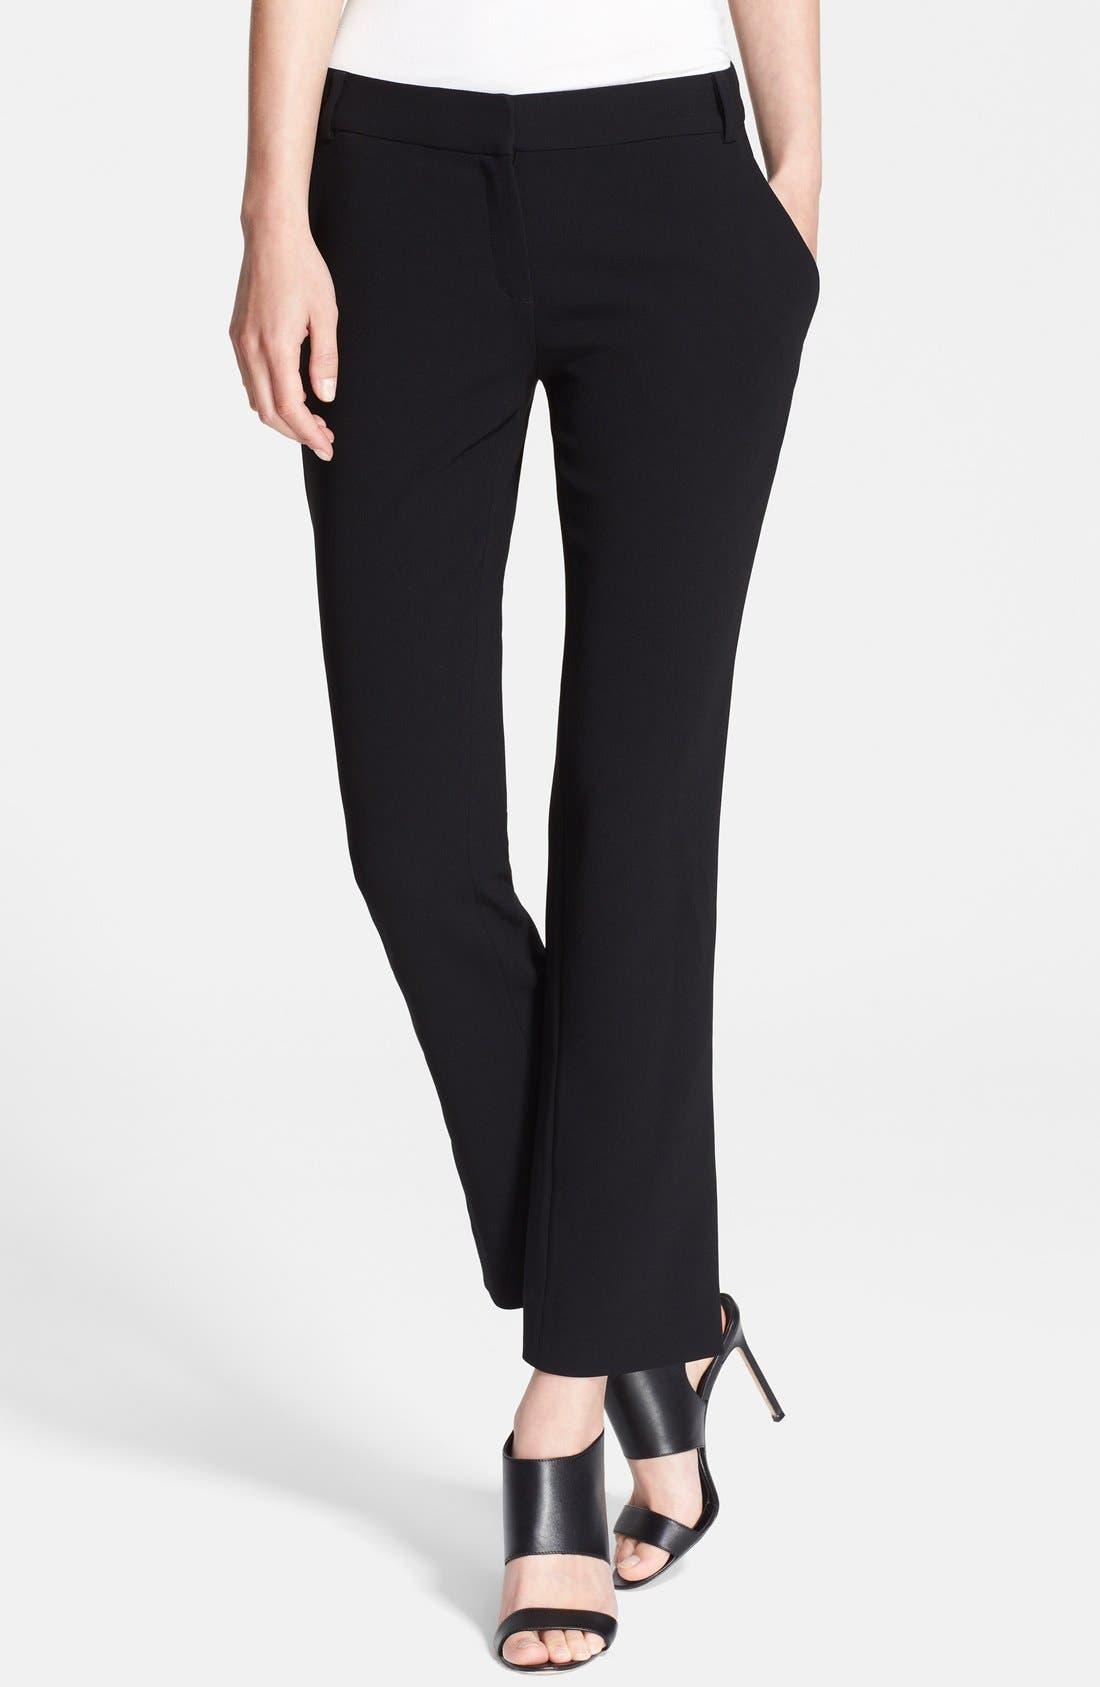 Alternate Image 1 Selected - Diane von Furstenberg 'Carissa' Woven Pants